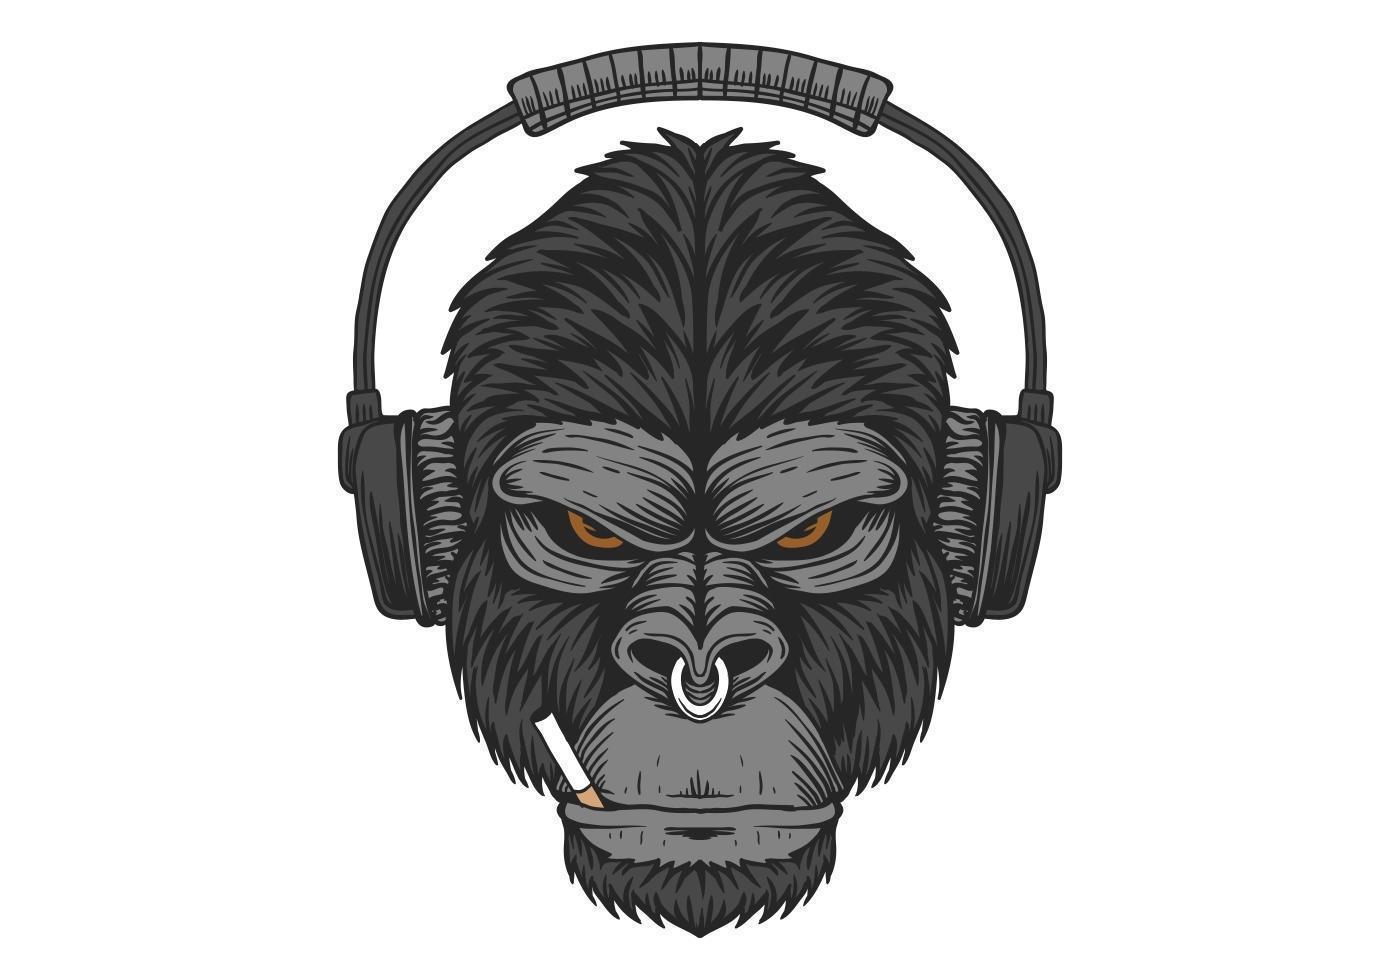 Gorilla headphone cigarette design vector